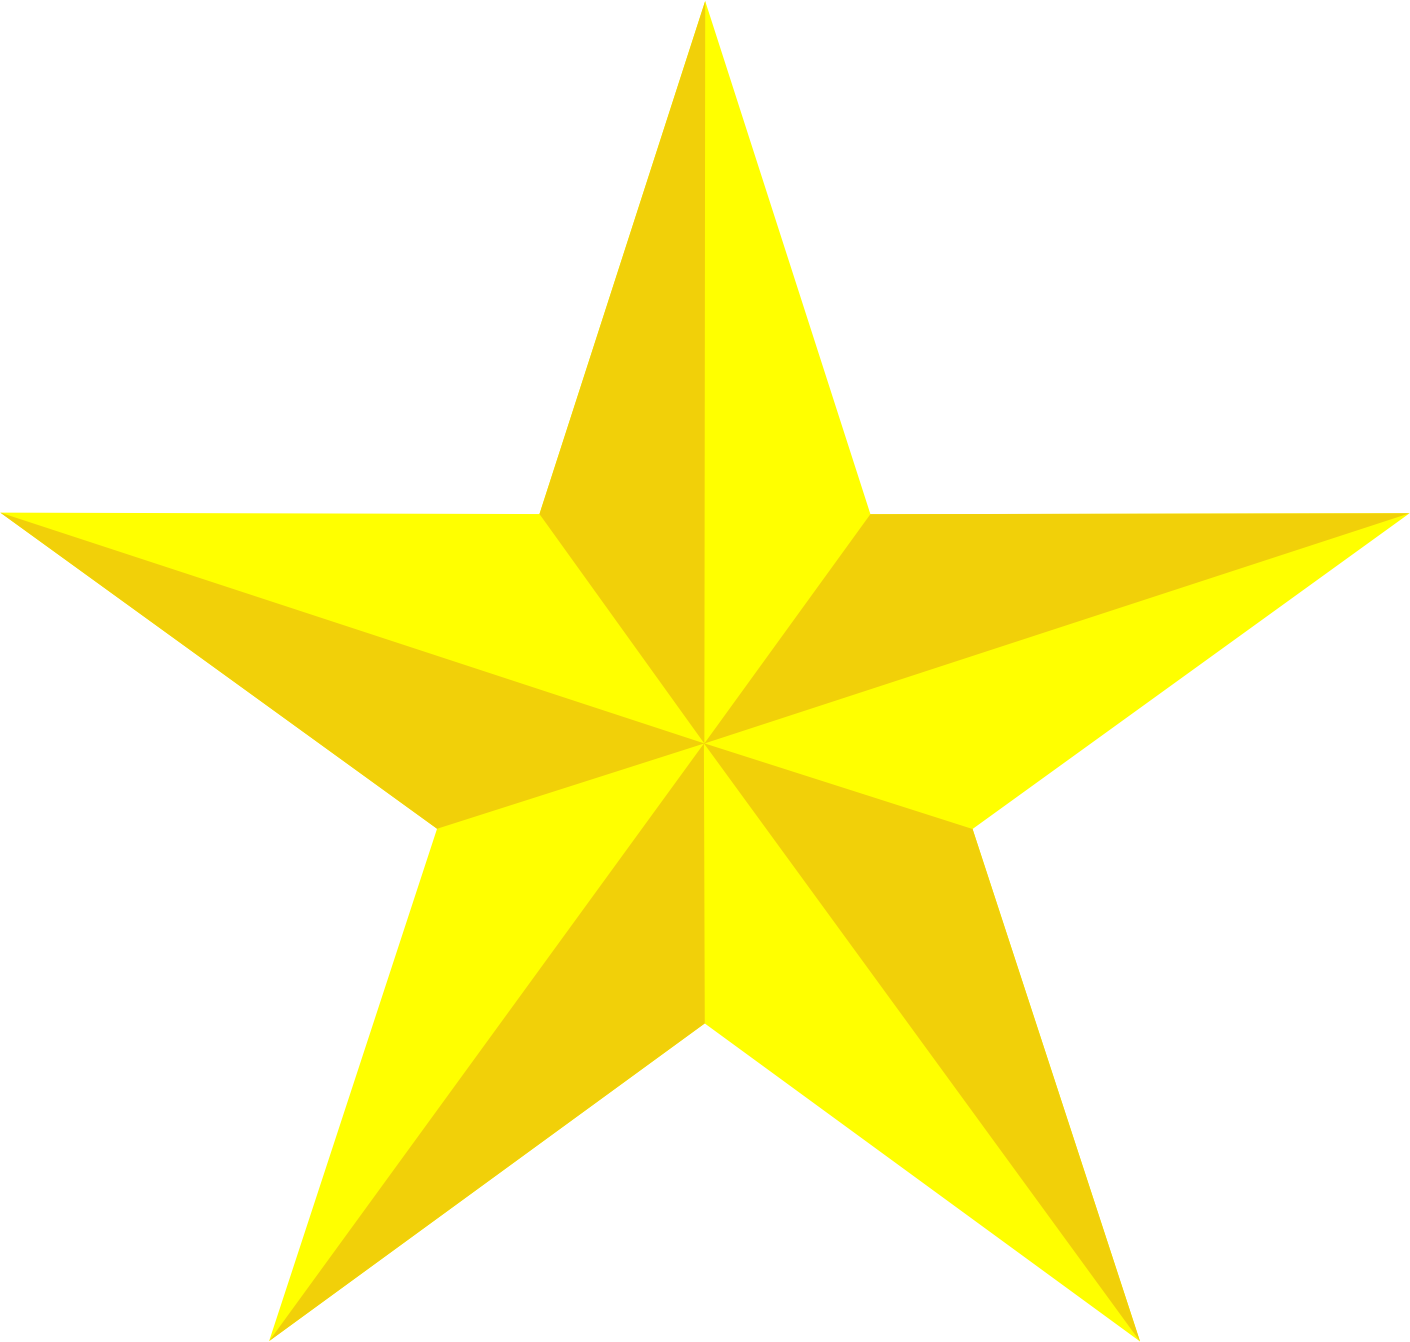 Talent show star clipart png download étoile-jaune-en-3d.png (1410×1342) | ЗИМА-ФОНЫ И СПЕЦ.ЭФФЕКТЫ ... png download